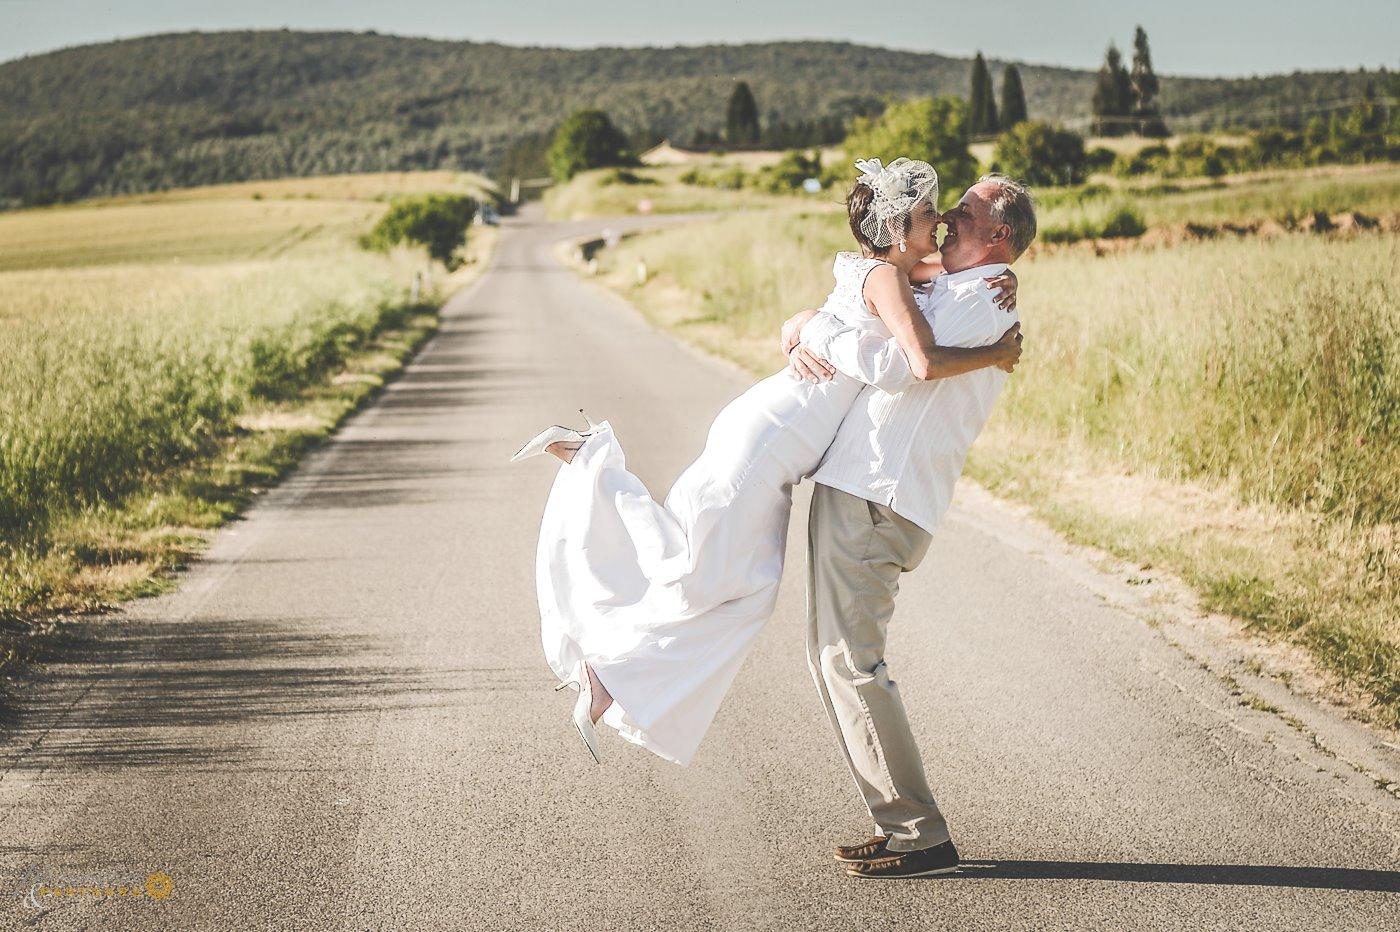 photographer_wedding_siena_18.jpg